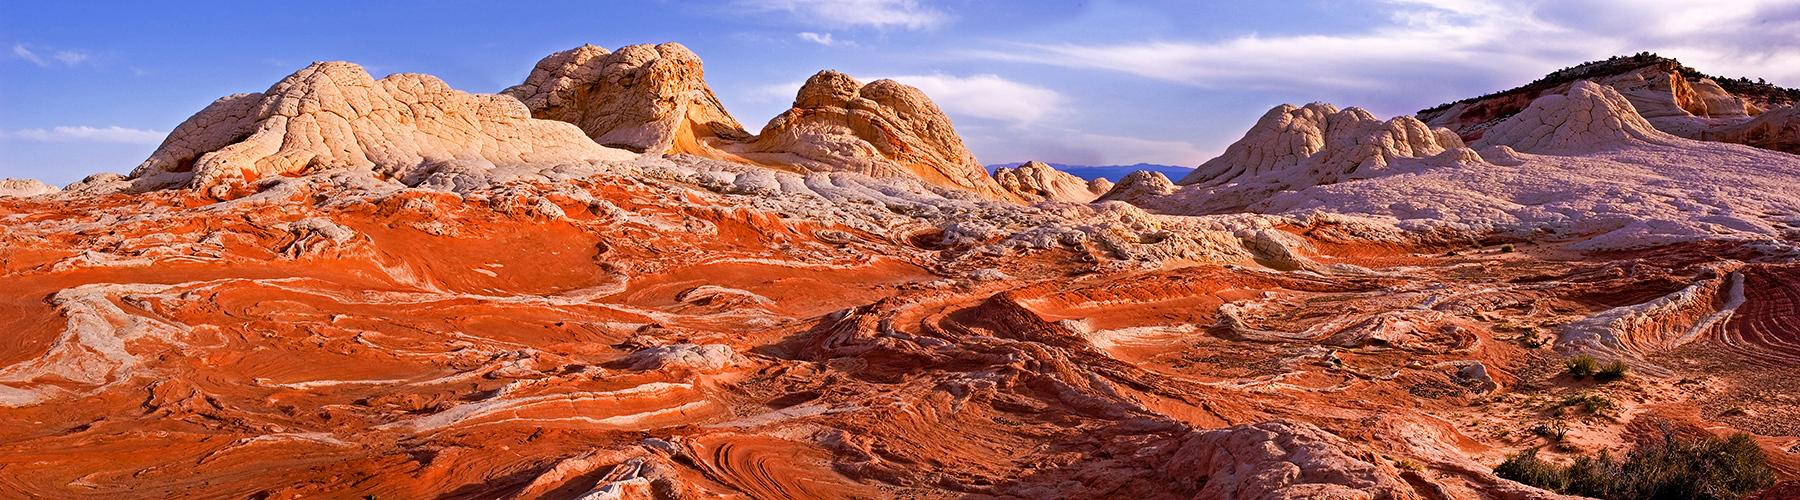 pan17: The White Pocket, Vermilion Cliffs National Monument, Arizona